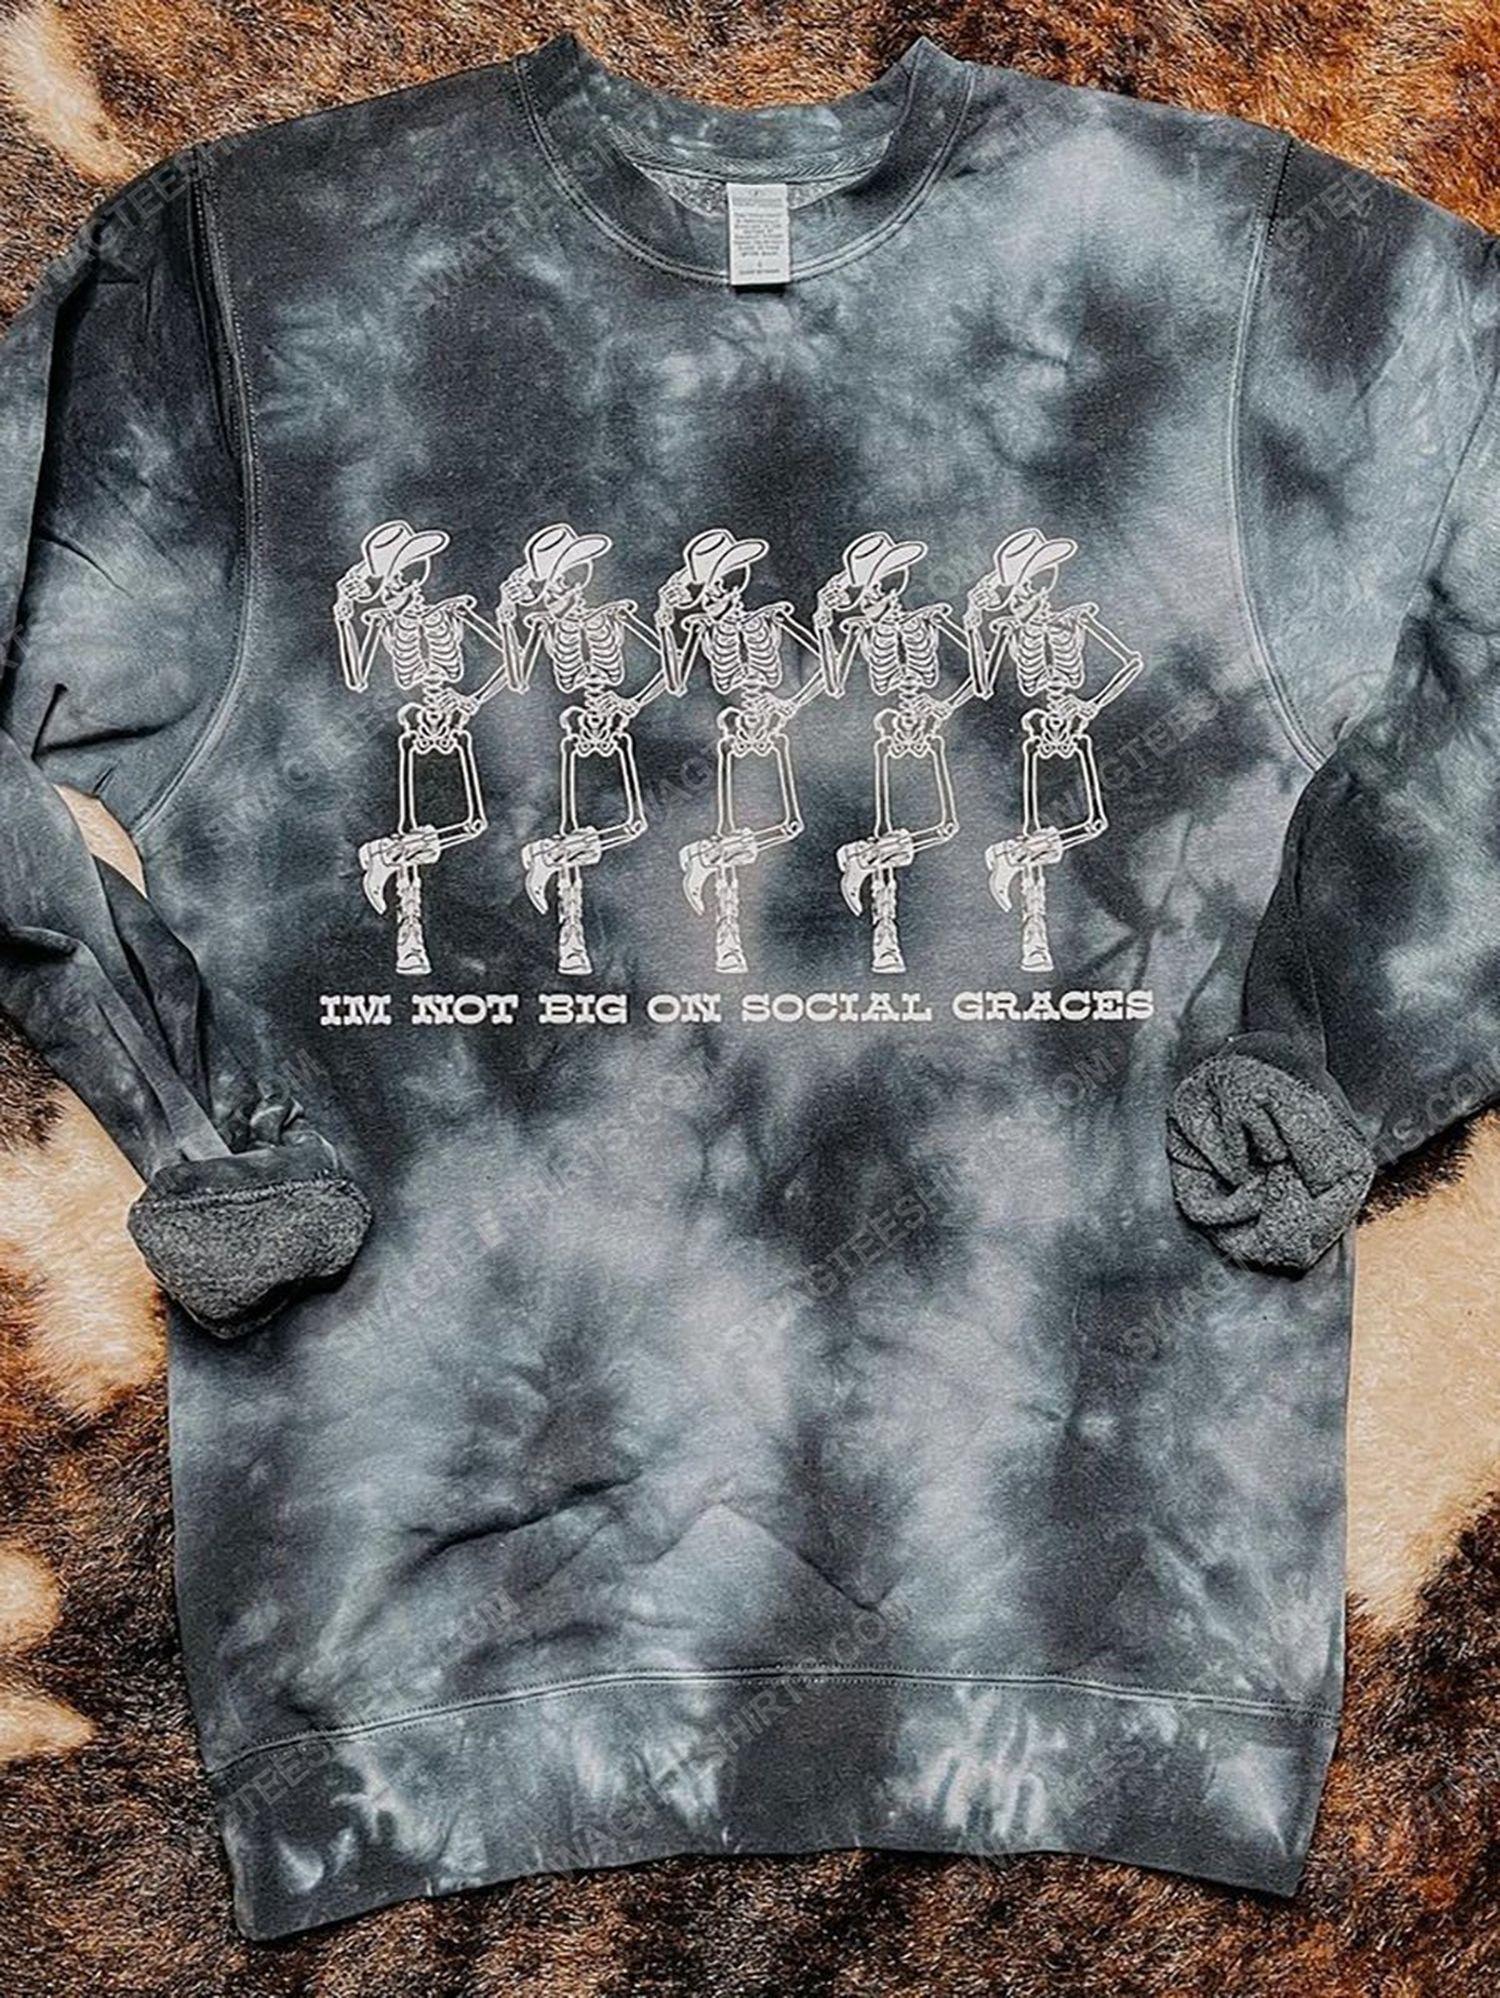 Halloween skull i'm not big on social graces full print shirt 1 - Copy (3)